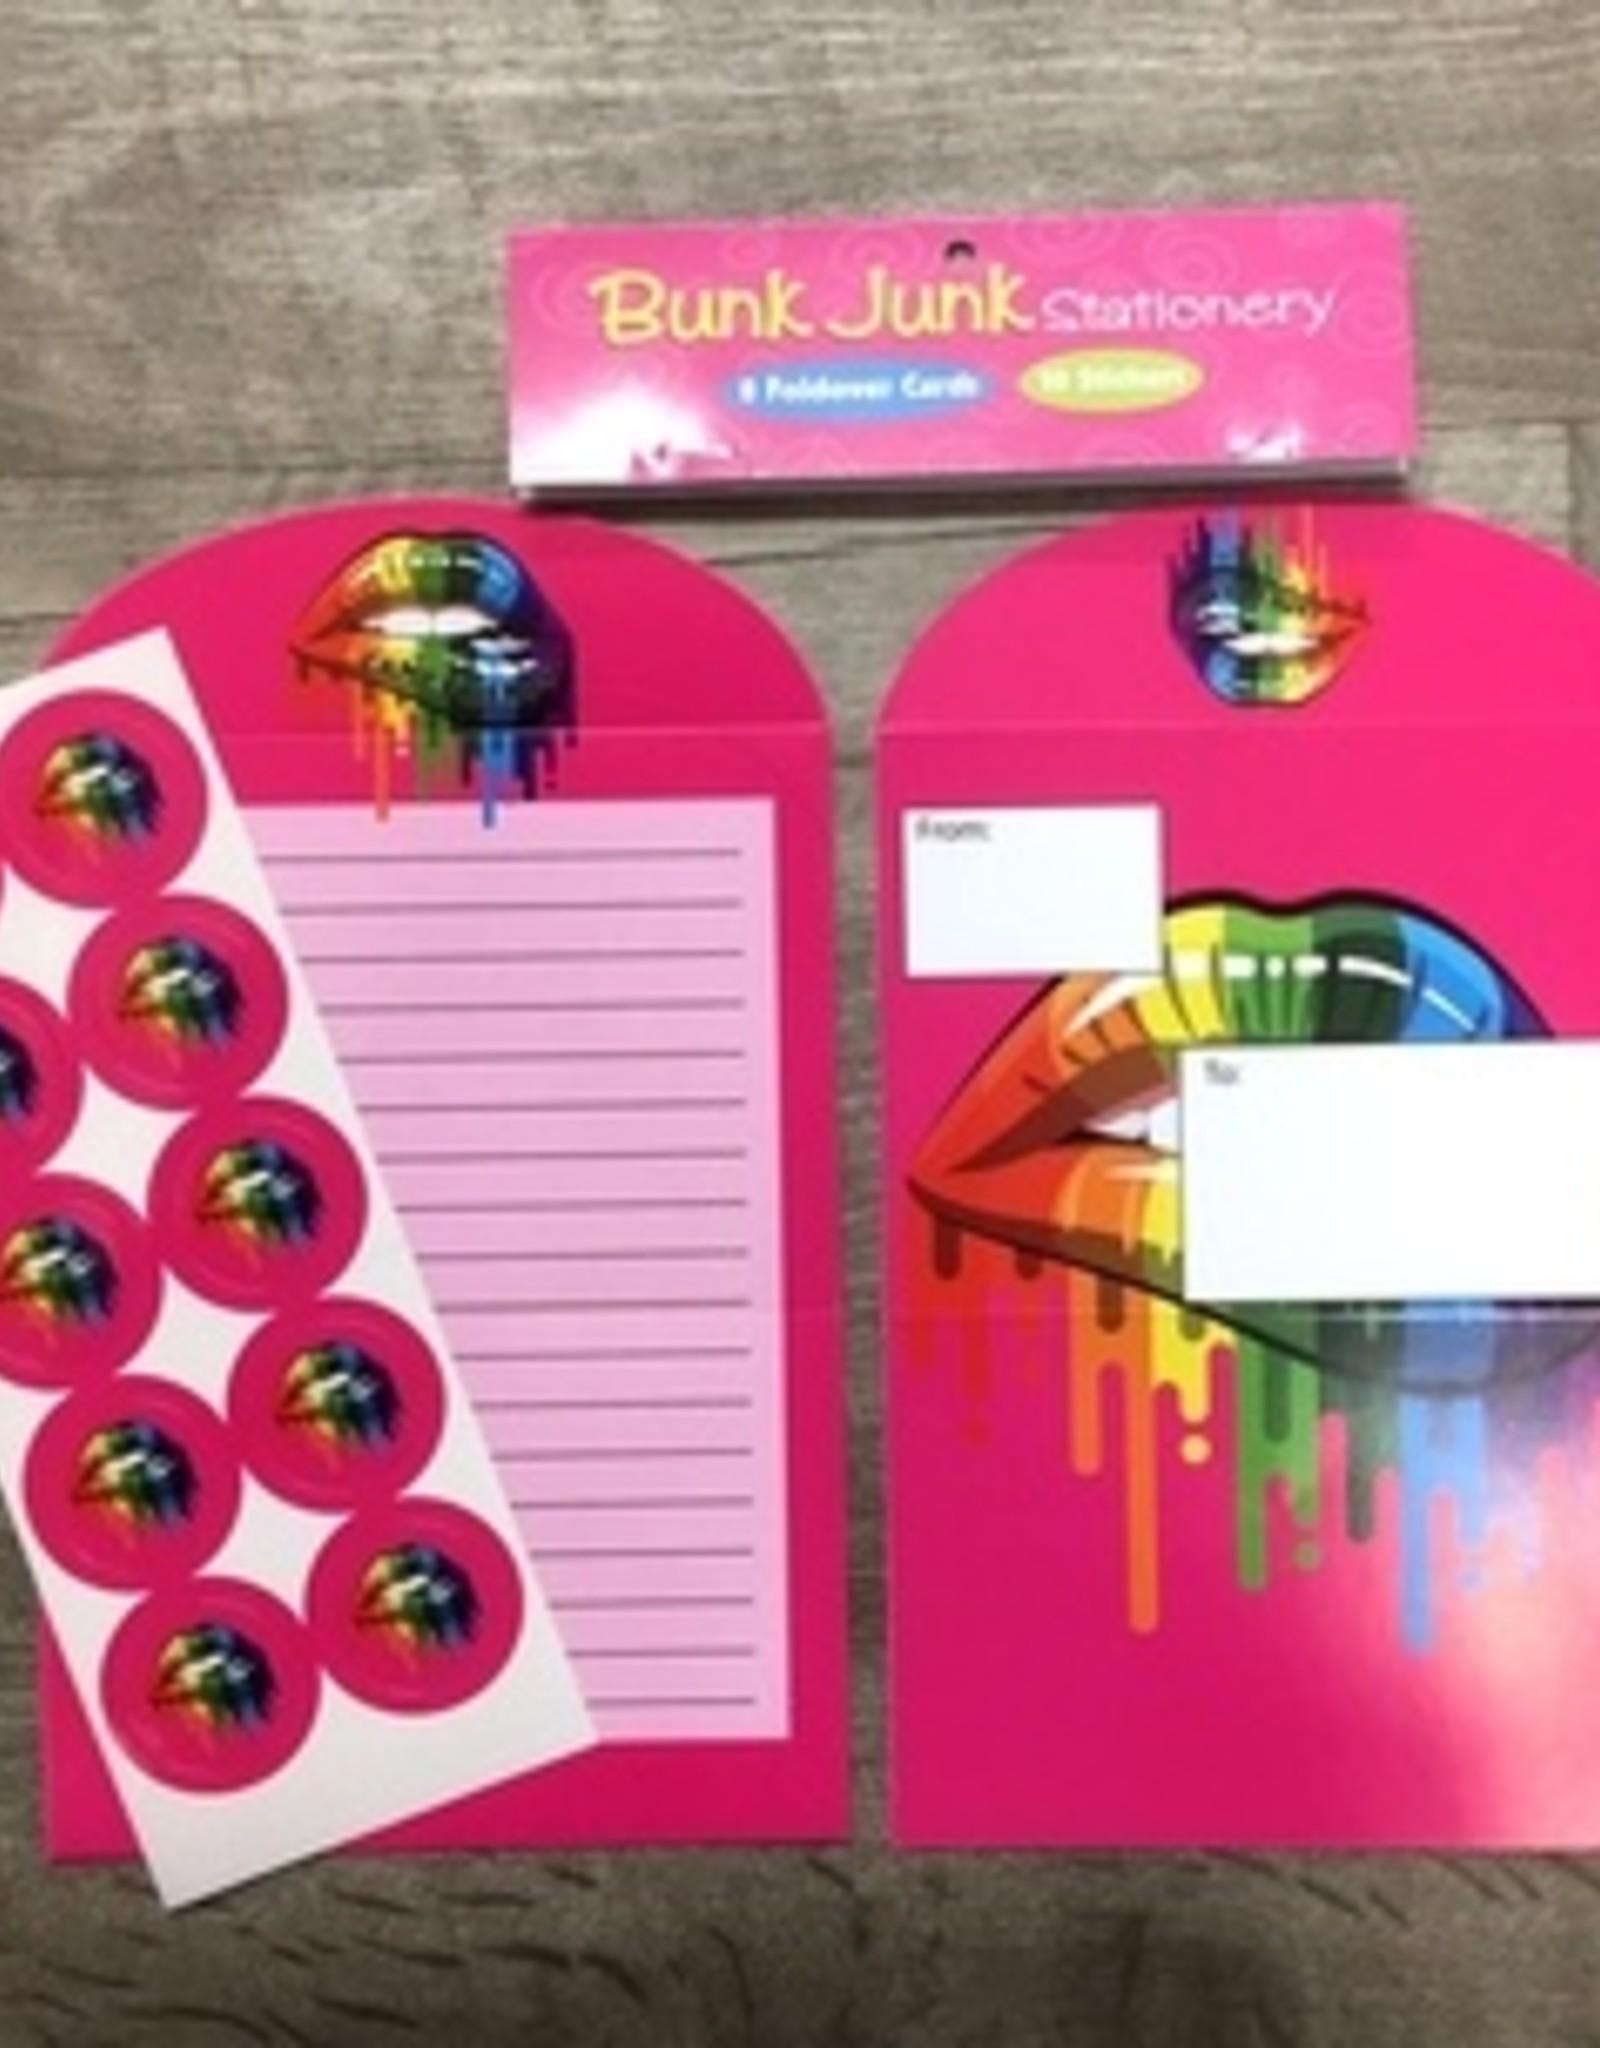 Bunk Junk Bunk Junk Camp Friends Lips Stationery Set